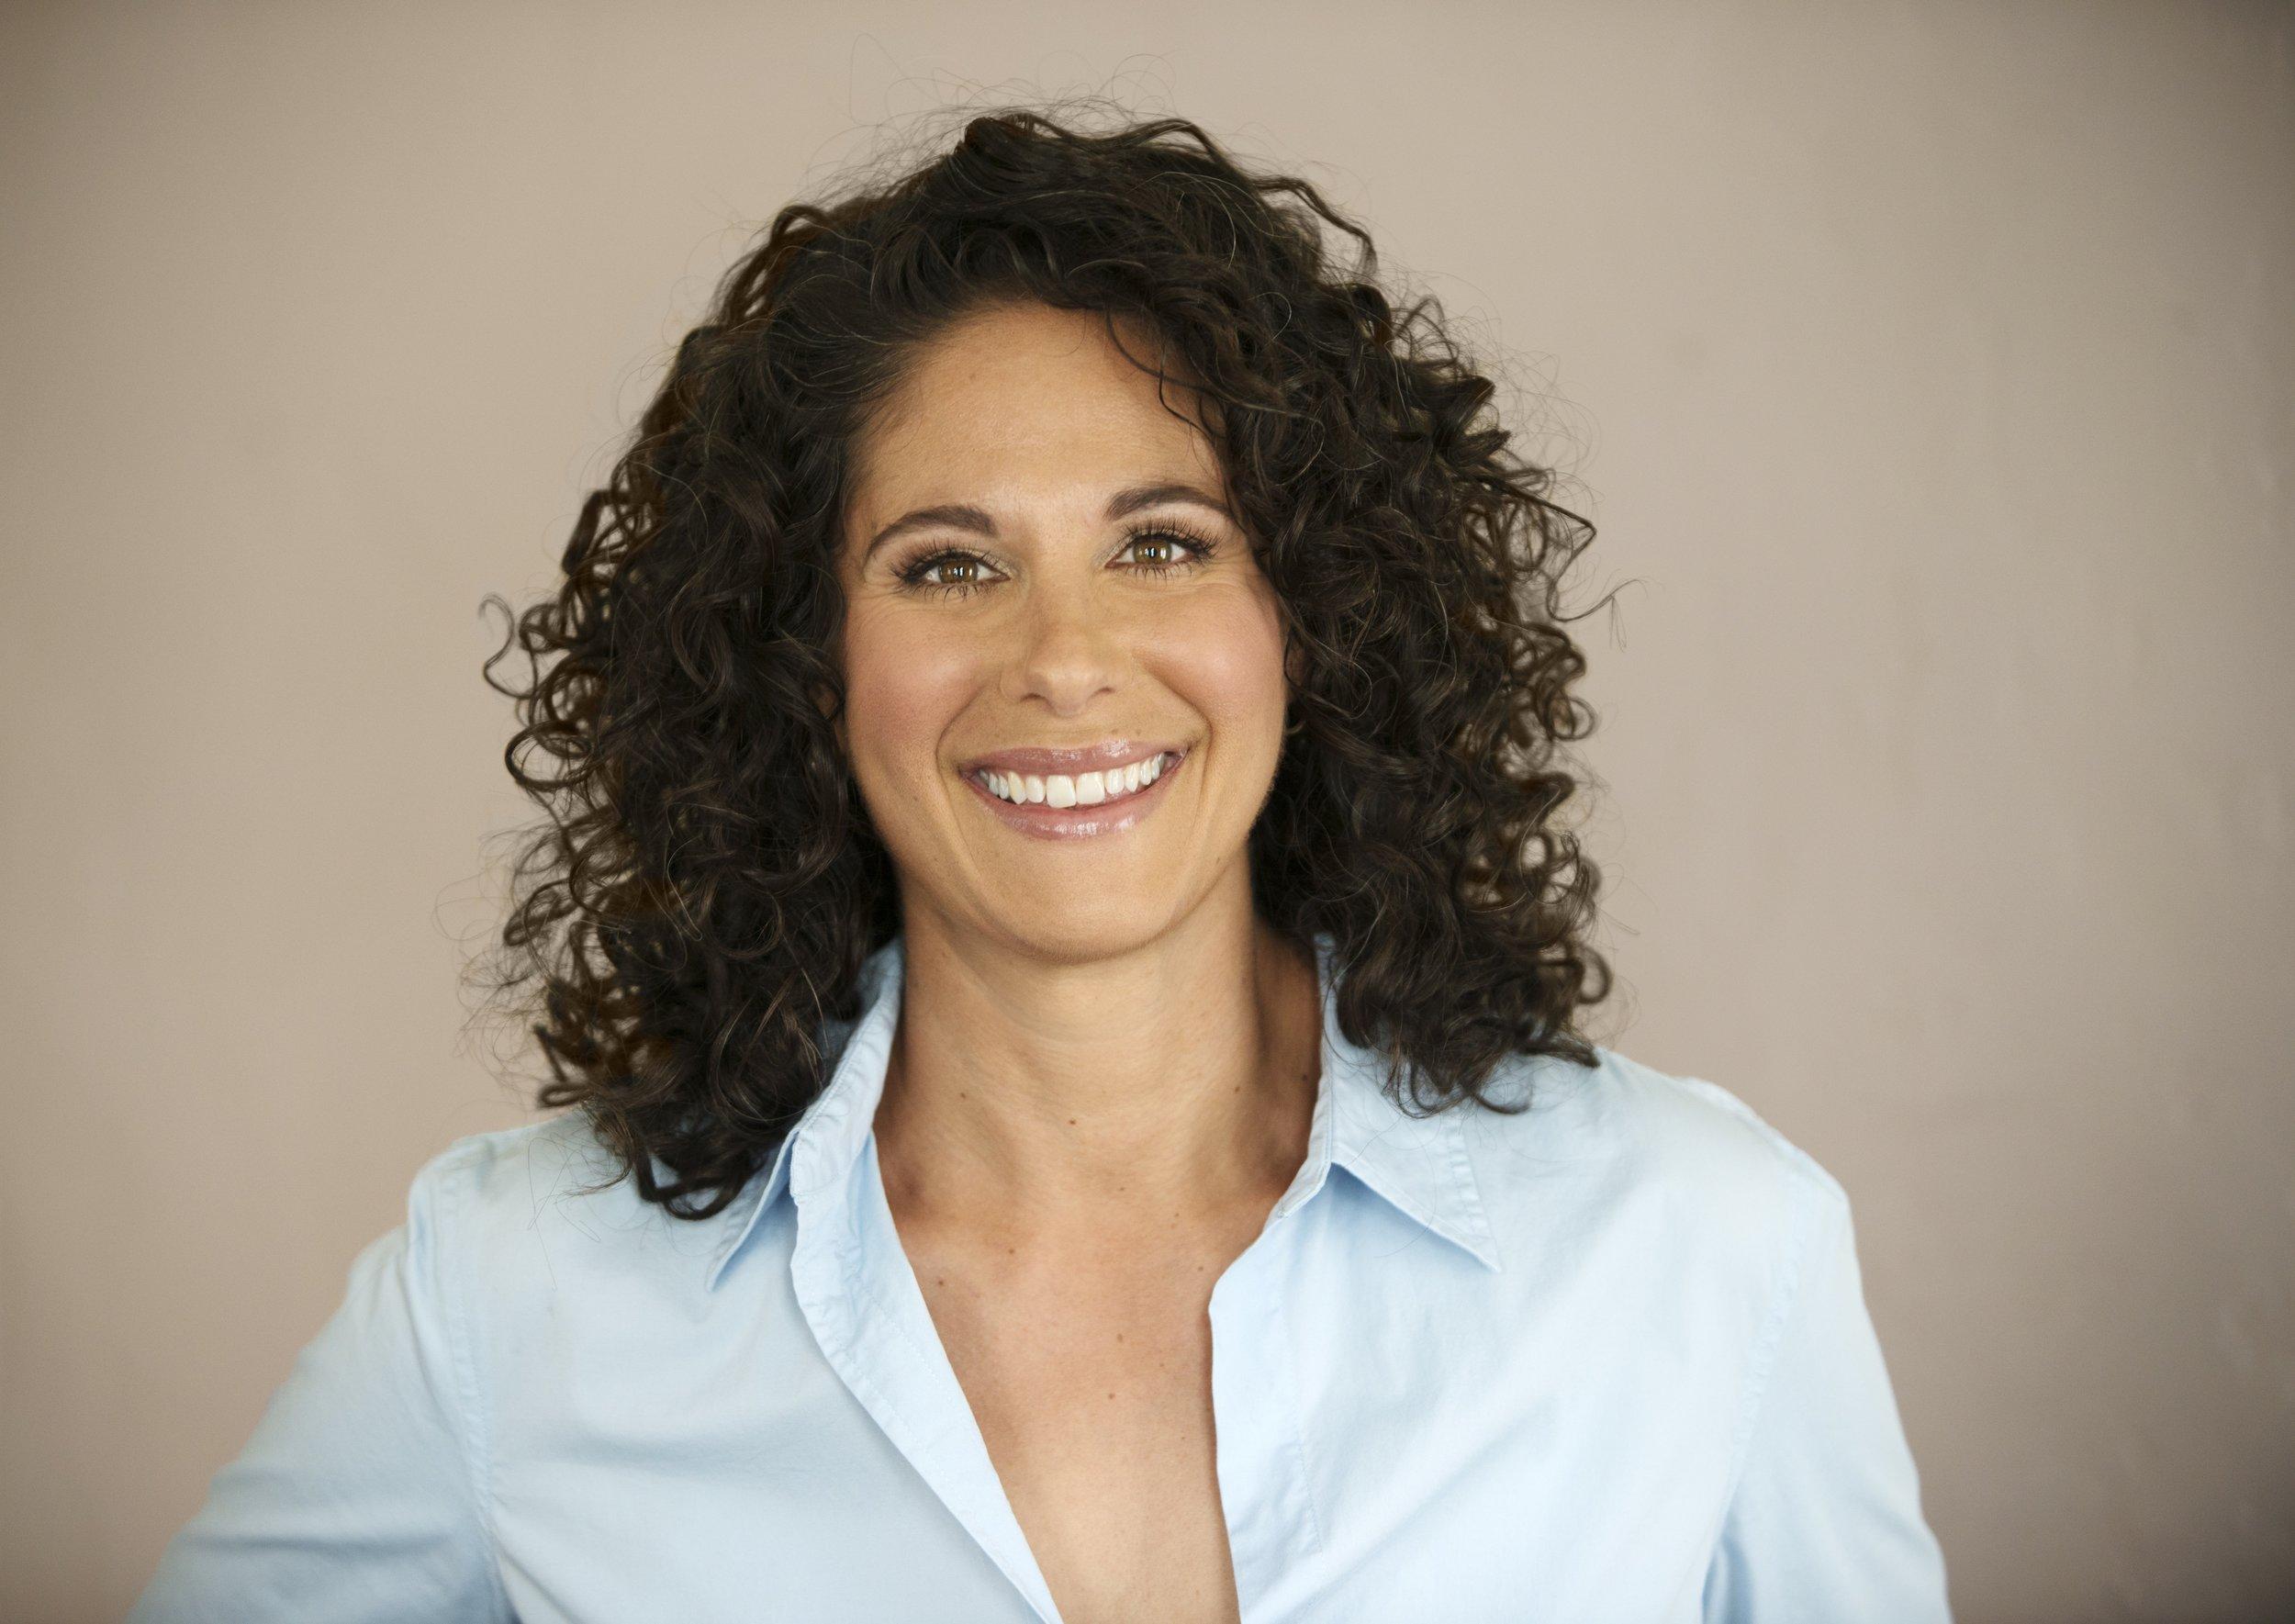 Dana Goldberg, Comedian & Host